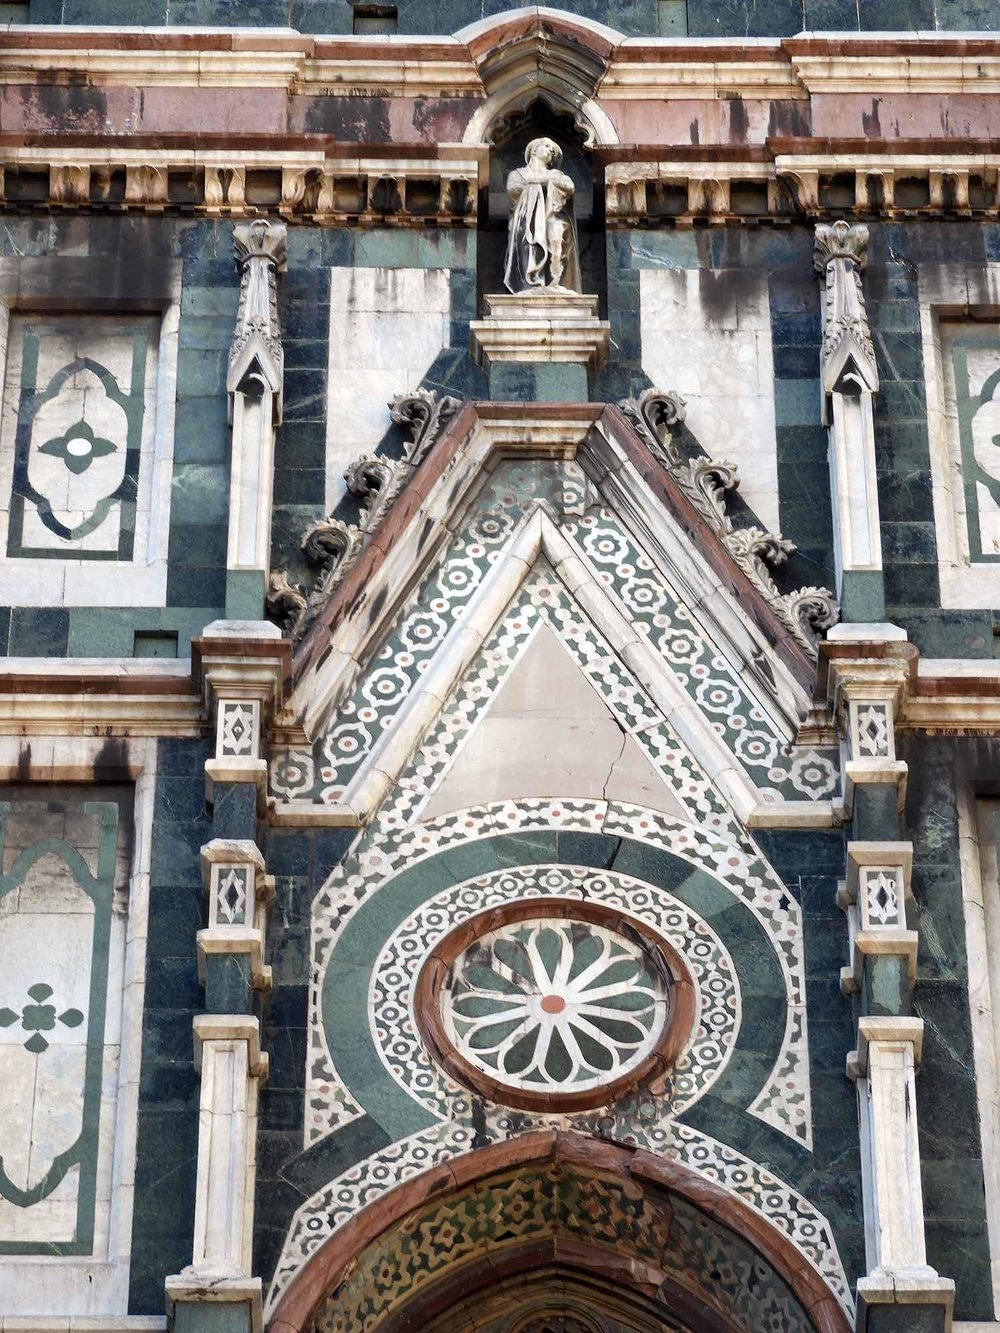 italy-italia-florence-cathedral-santa-maria-del-fiori-marble-exterior.JPG